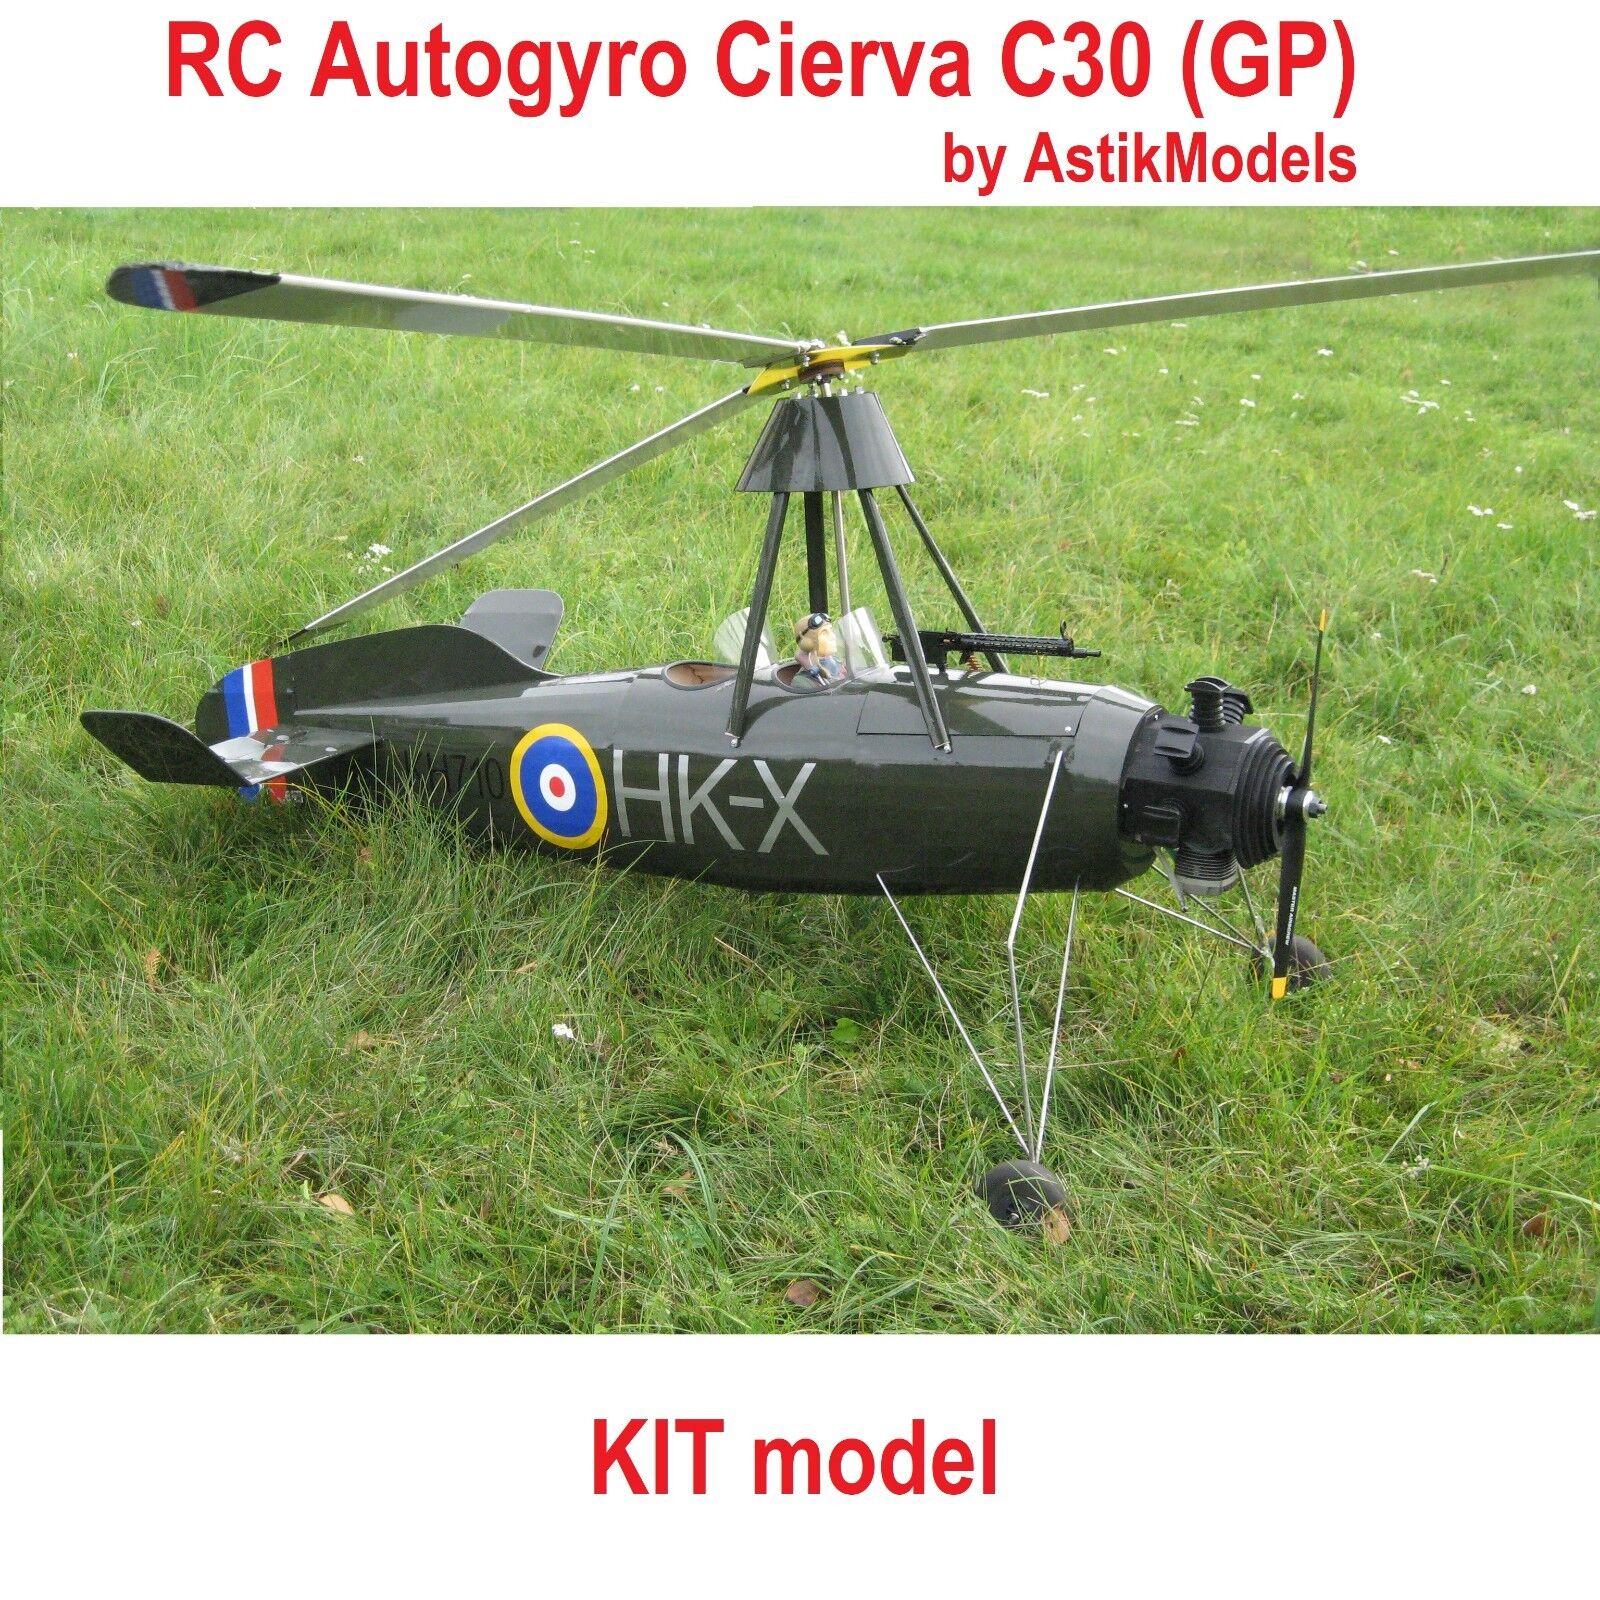 RC Cierva c30 armazón helicópteros kit modelo de astikmodels Dwarfs Autogyro